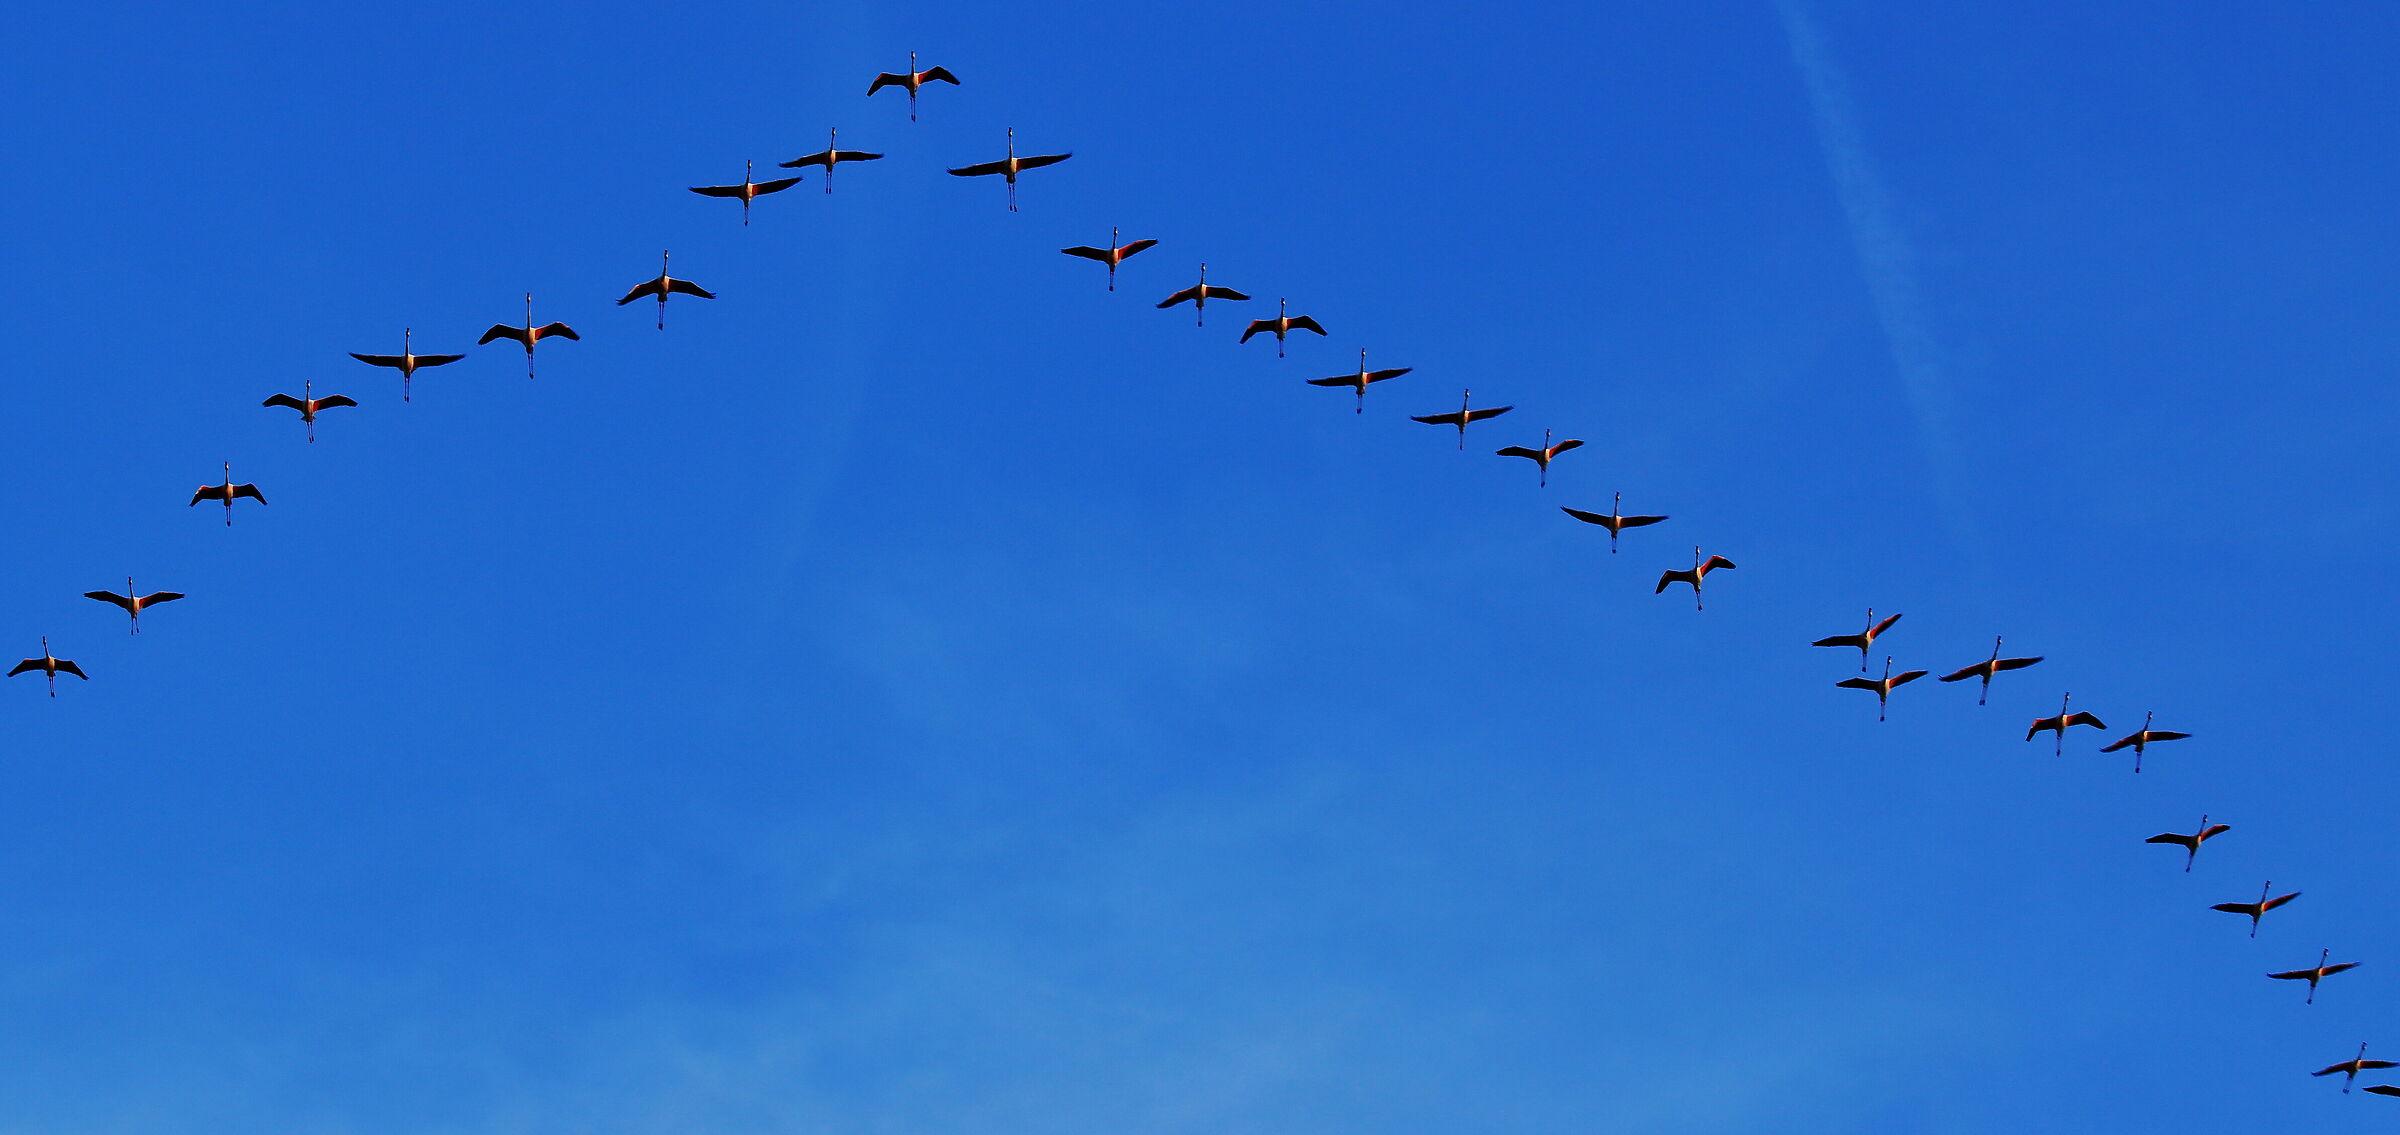 ... flamingos in formation......